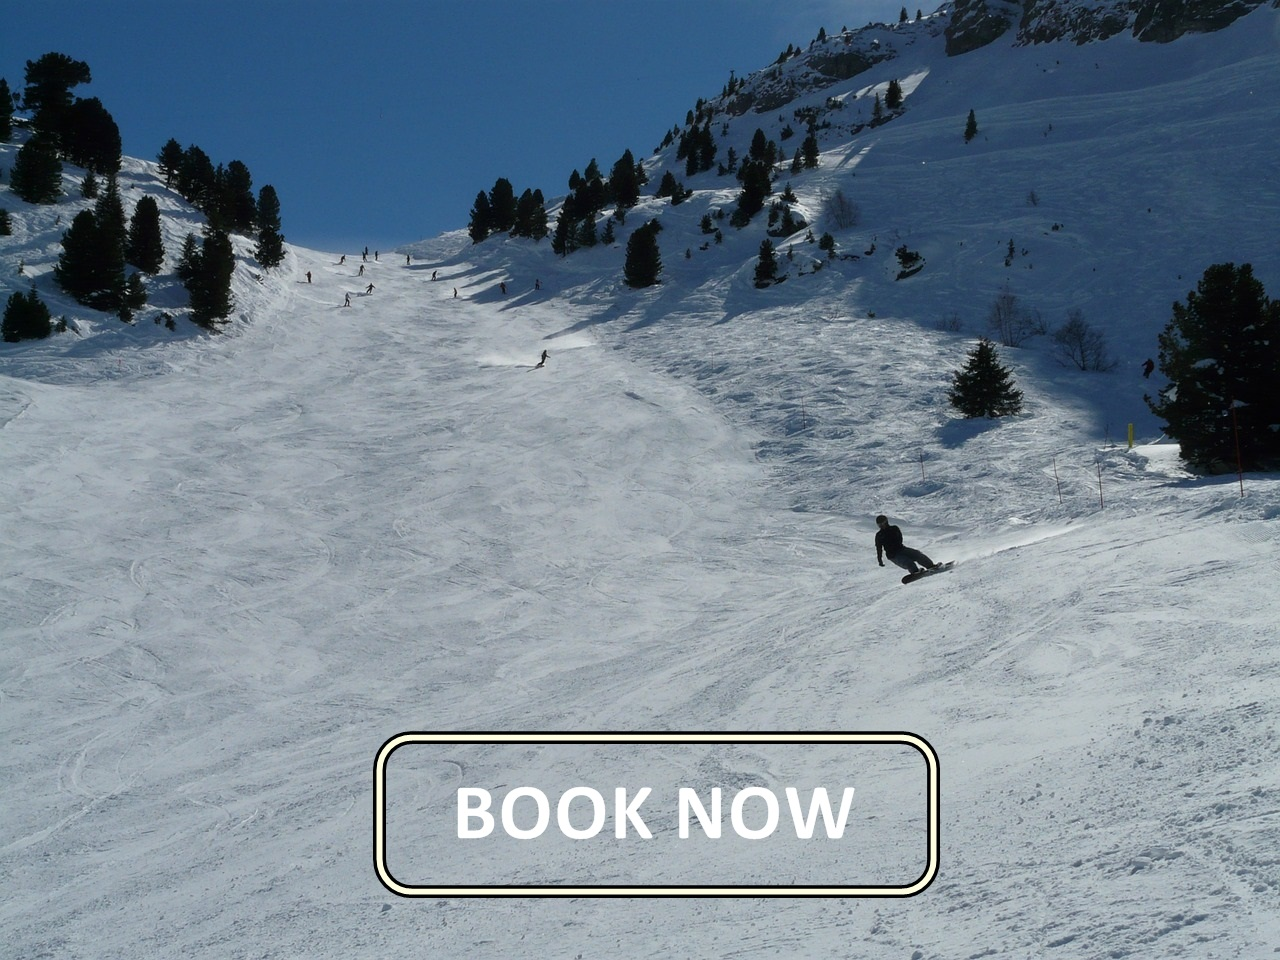 ski resort transfer snowboard book